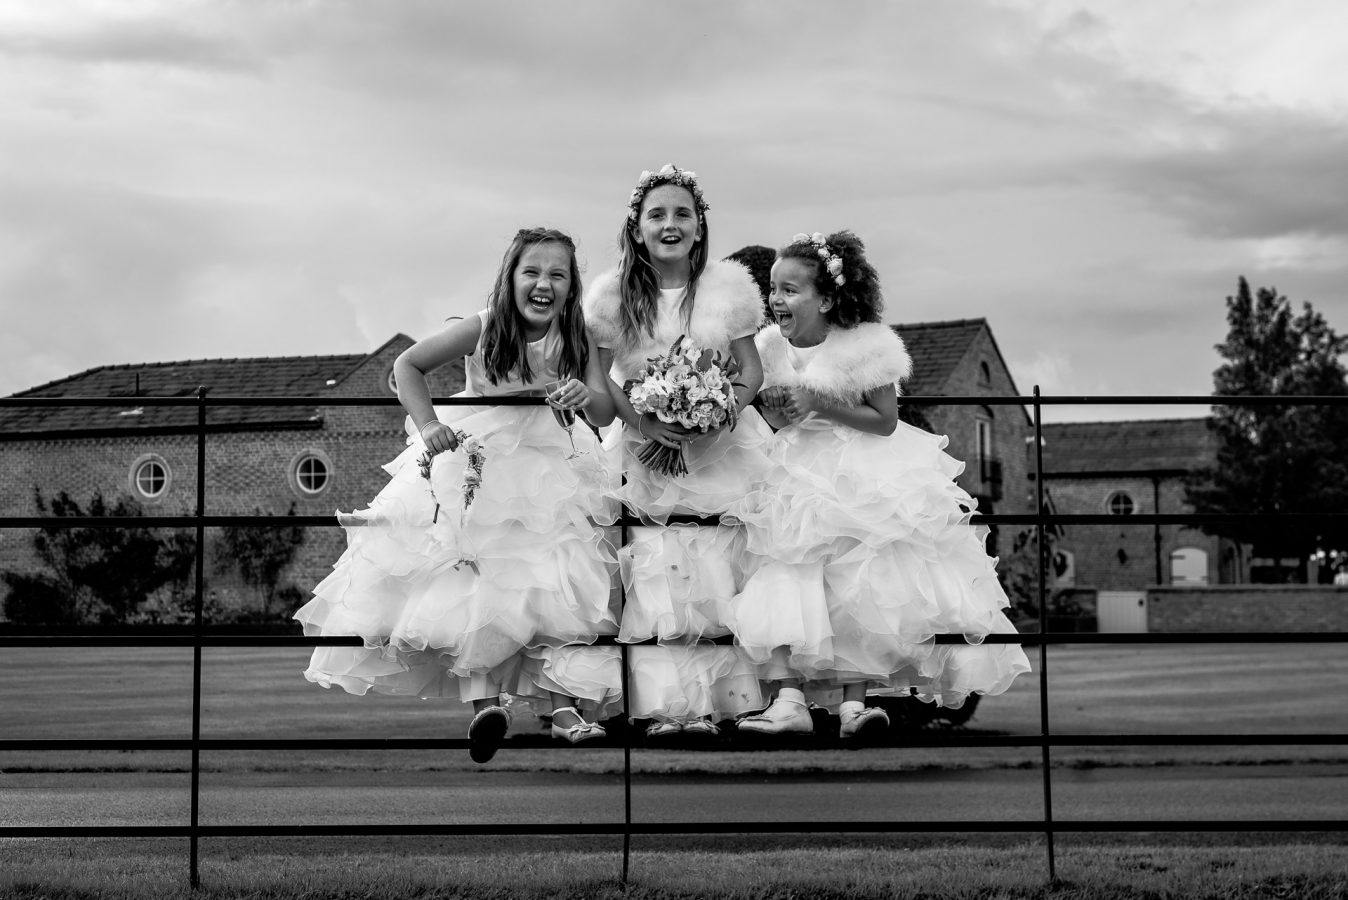 three-bridesmaids-best-wedding-photographs-2017